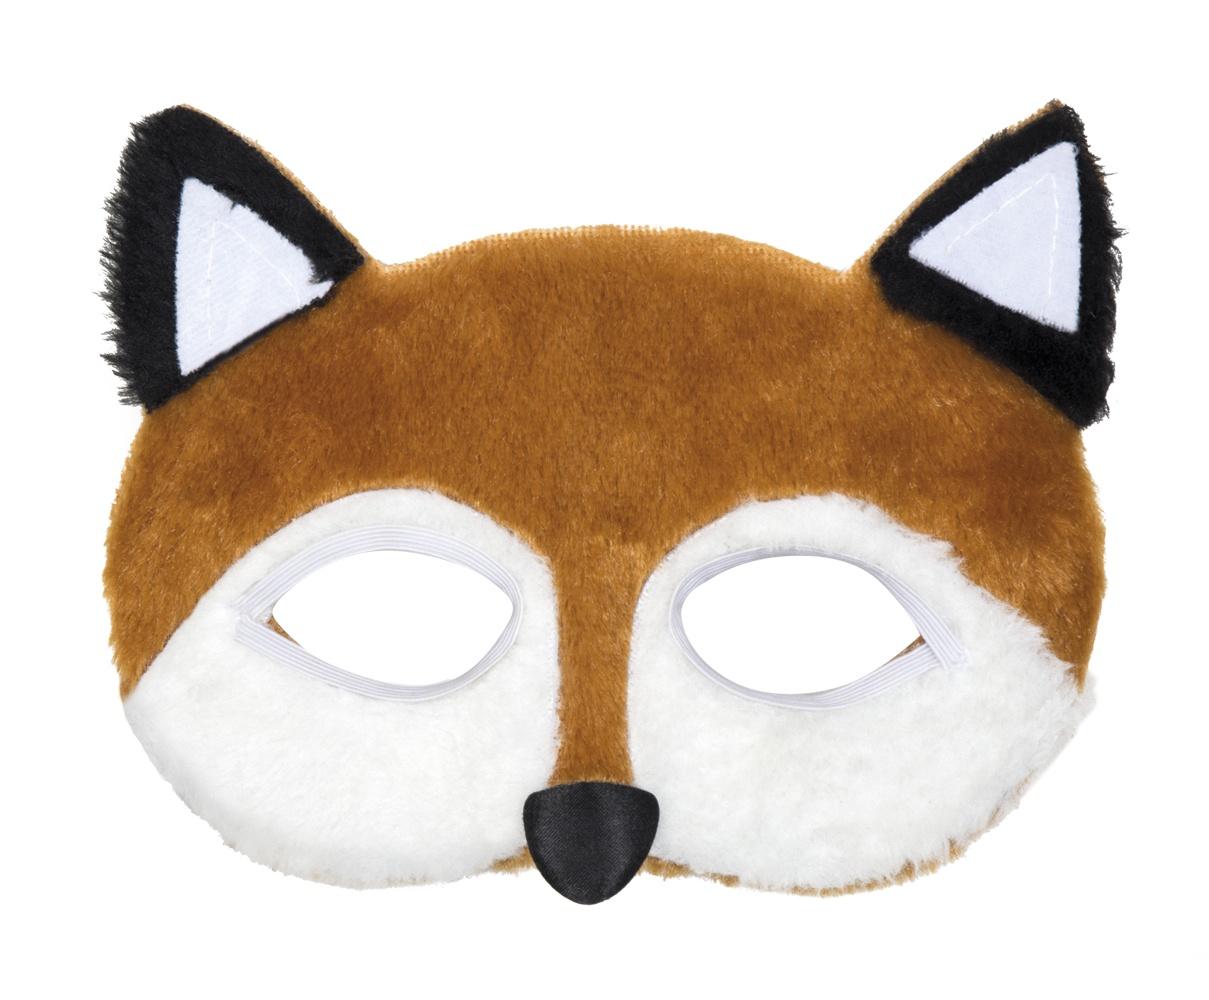 05393e7d3bca9c Boland halfmasker pluche dieren vos - Internet-Toys